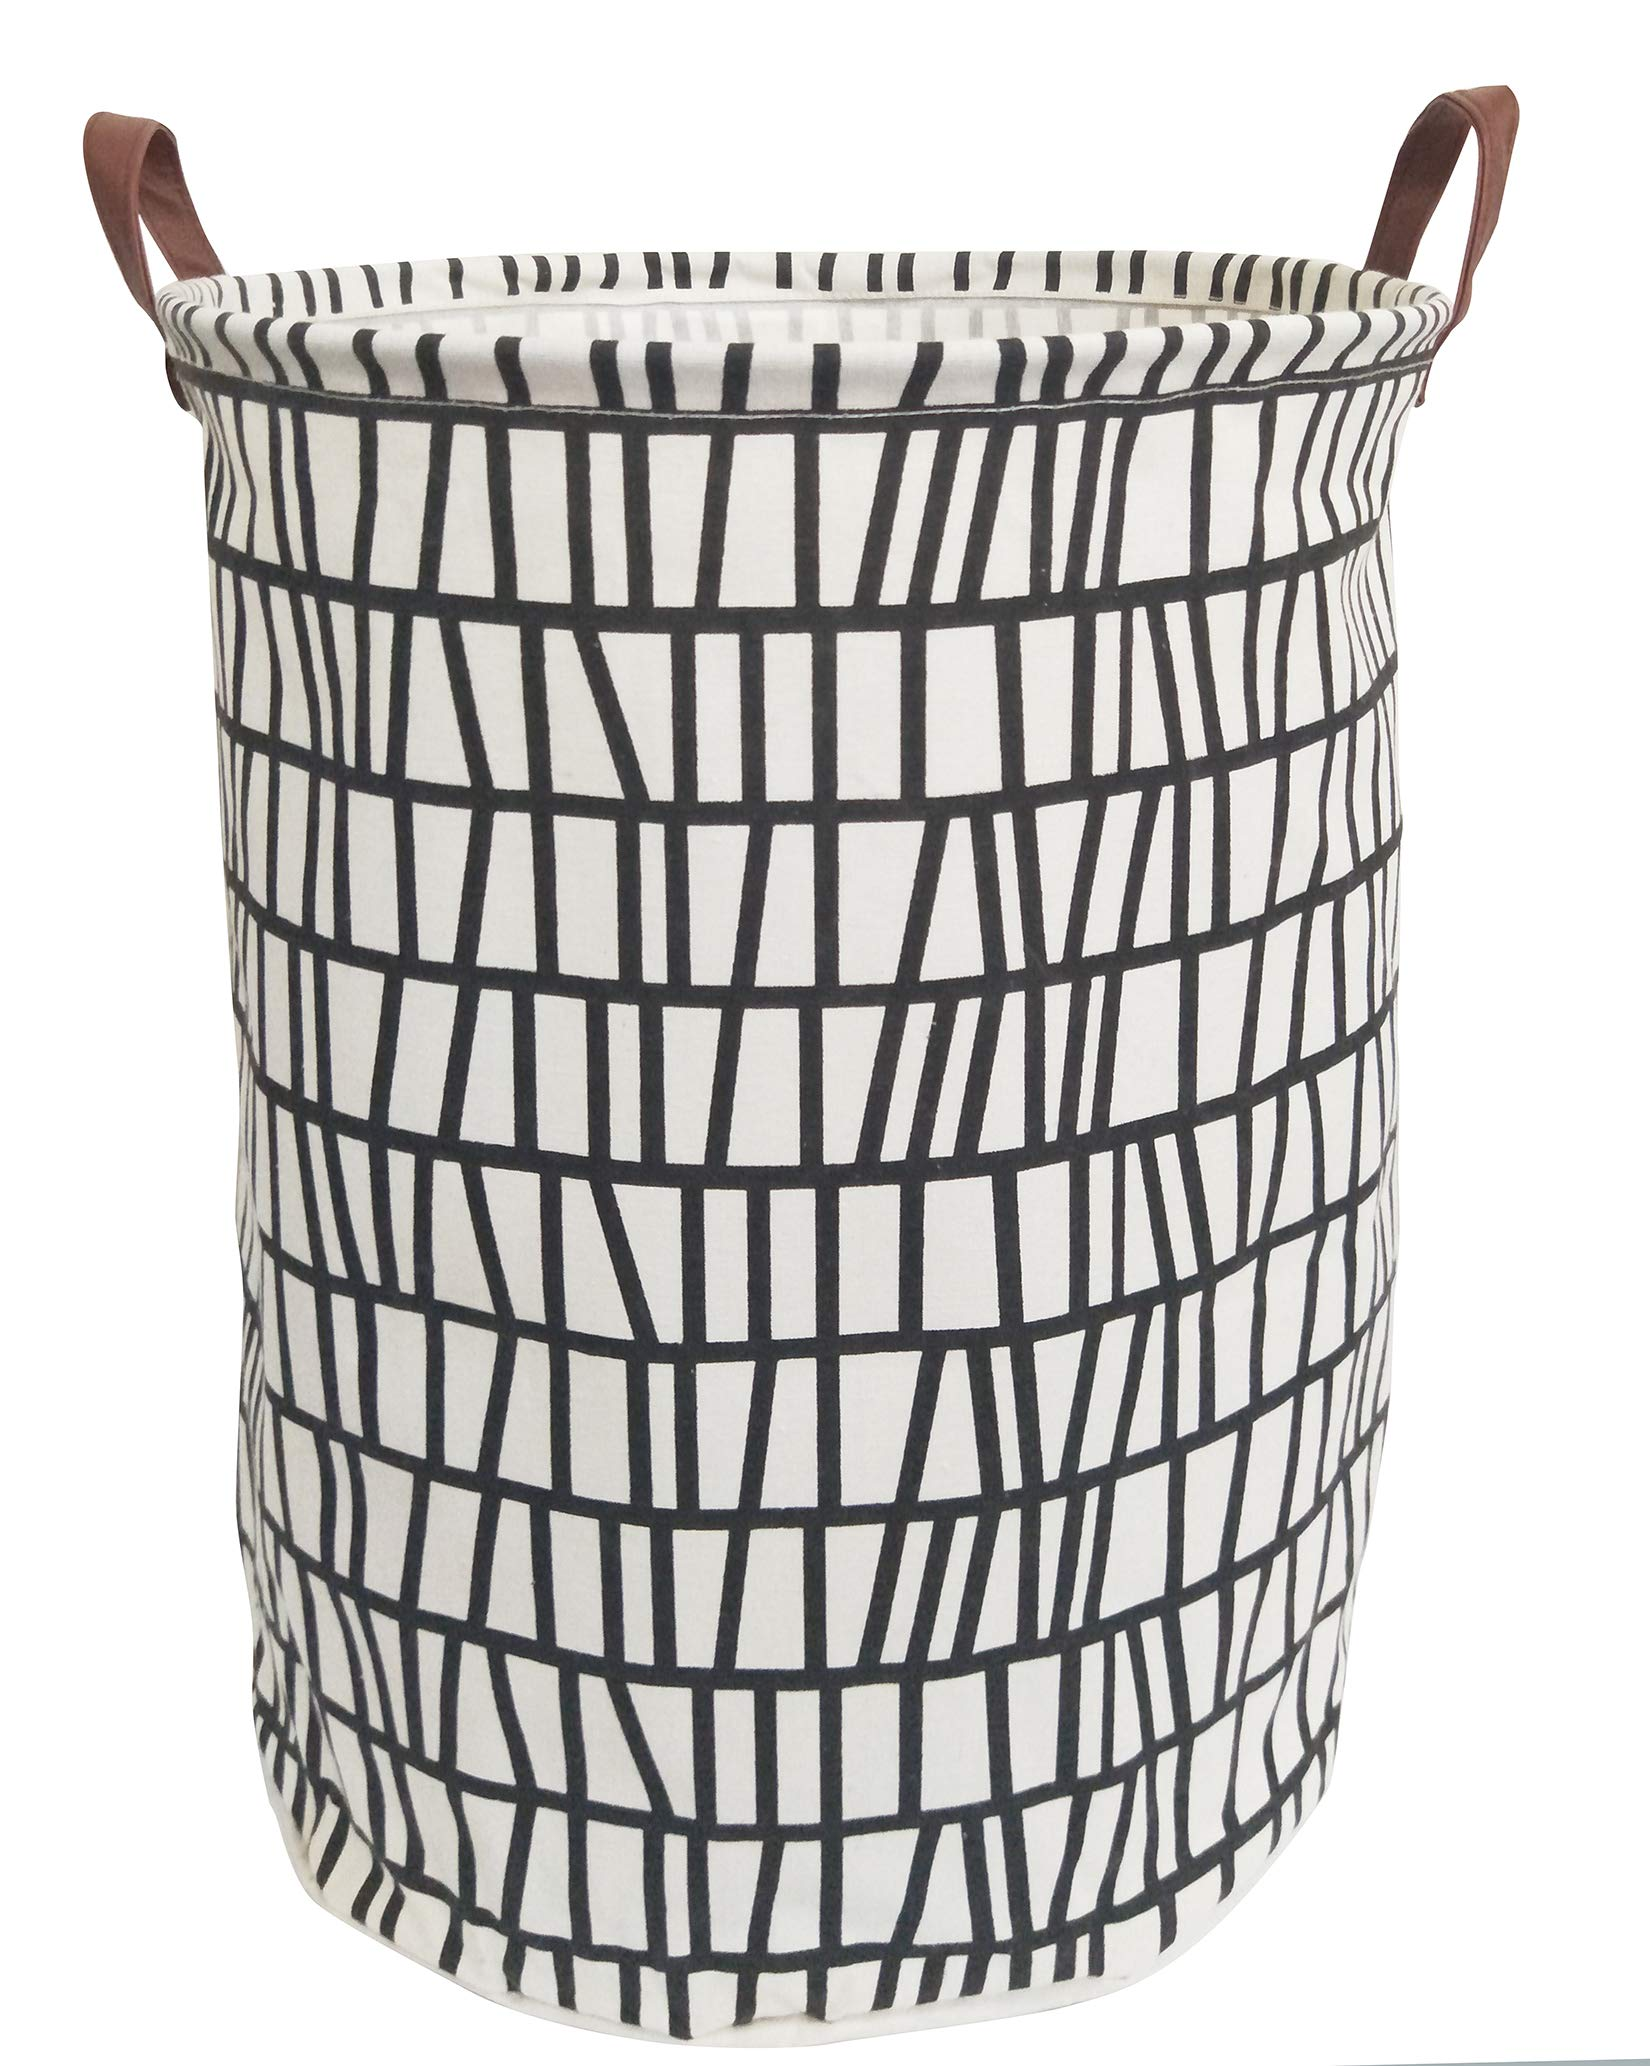 ESSME Laundry Hamper,Collapsible Canvas Waterproof Storage Bin Kids, Nursery Hamper,Gift Baskets,Home Organizer (Black Stripes)